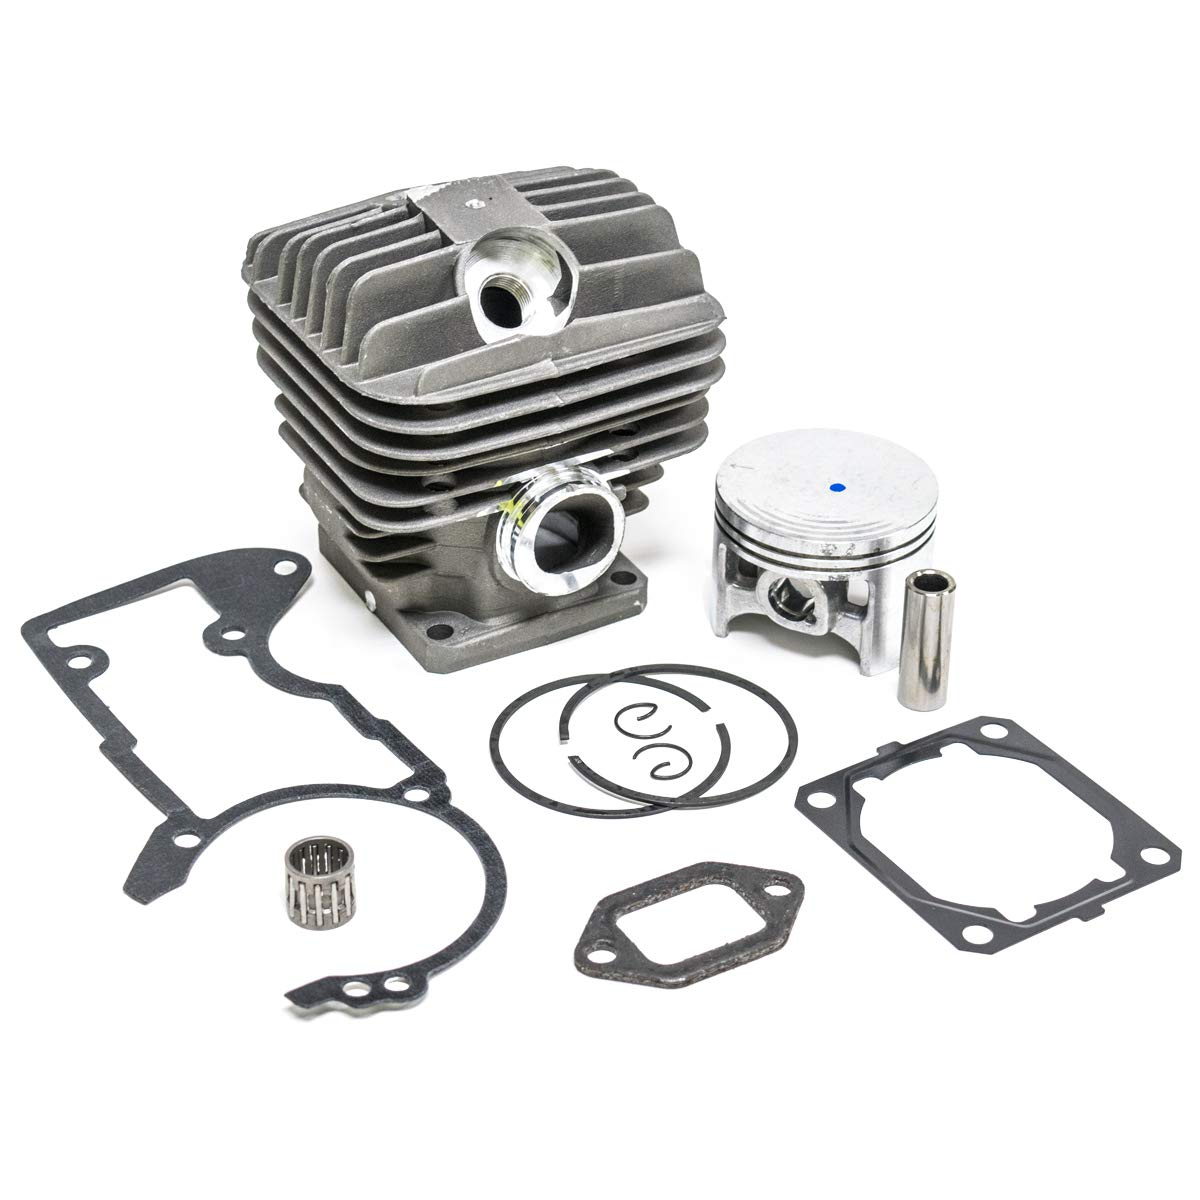 54MM Big Bore Cylinder Piston Gasket Bearing for Stihl 046 MS460 1128 020 1221